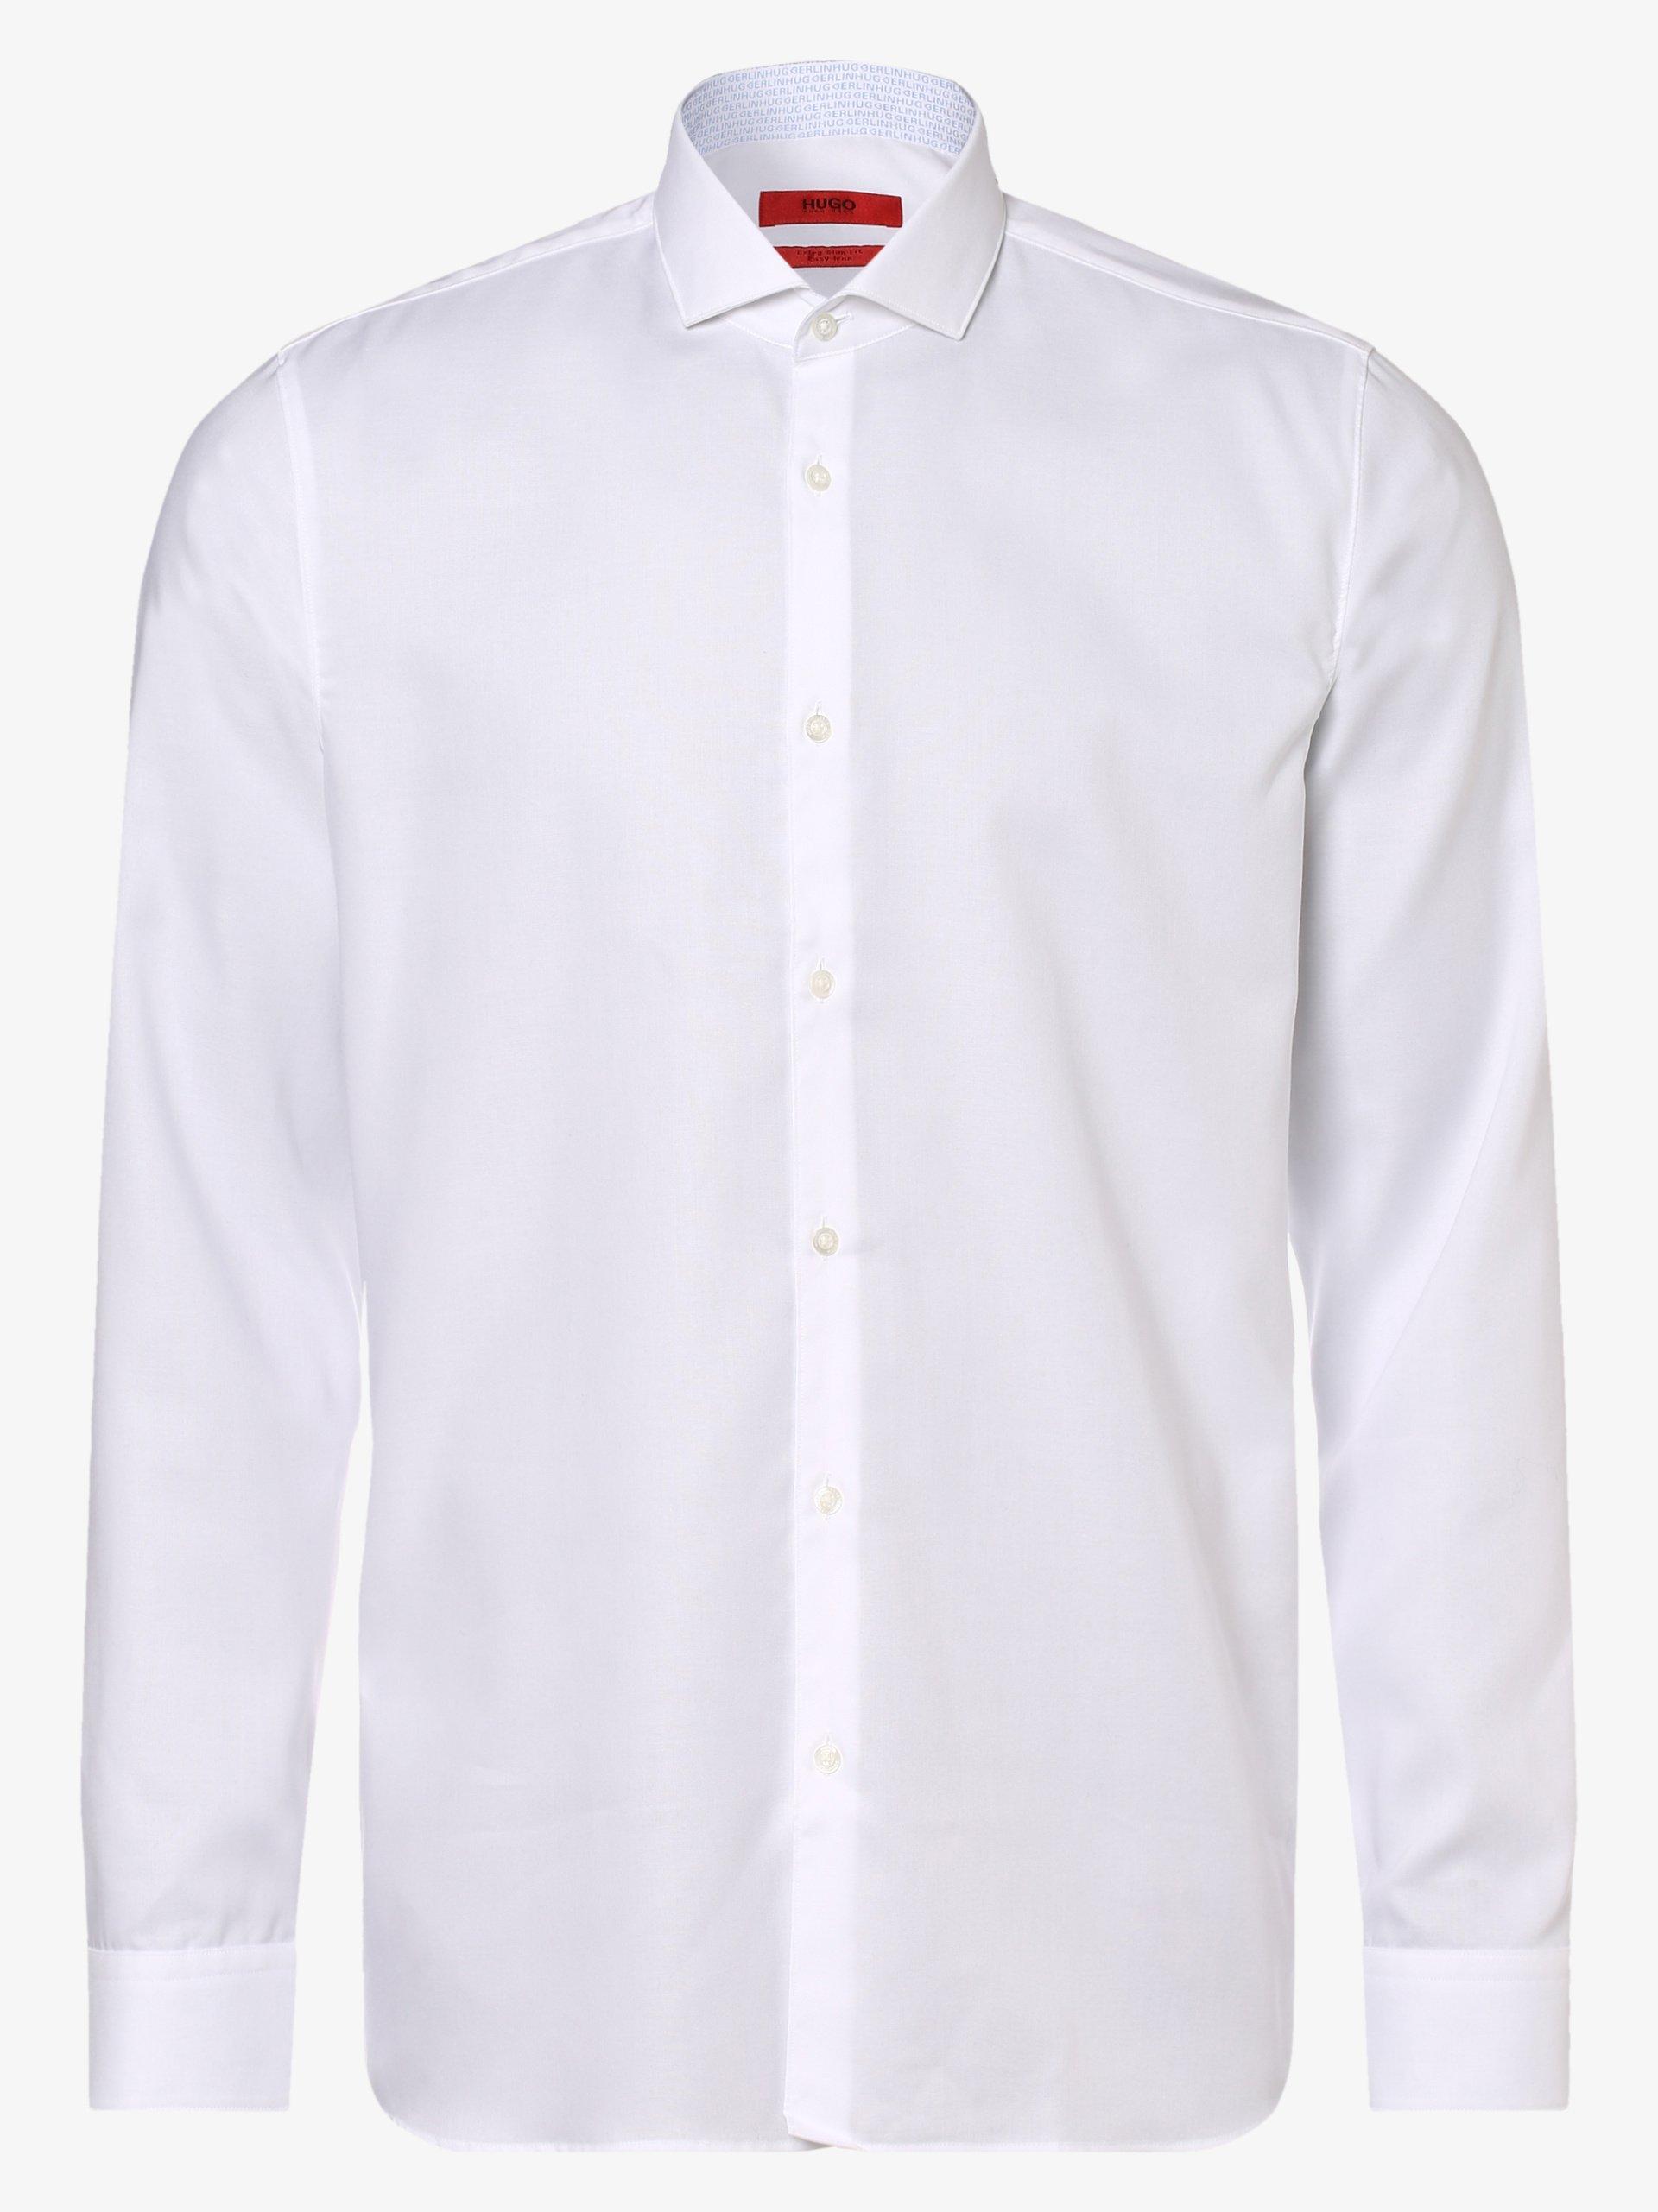 HUGO Herren Hemd - Bügelleicht - Errik